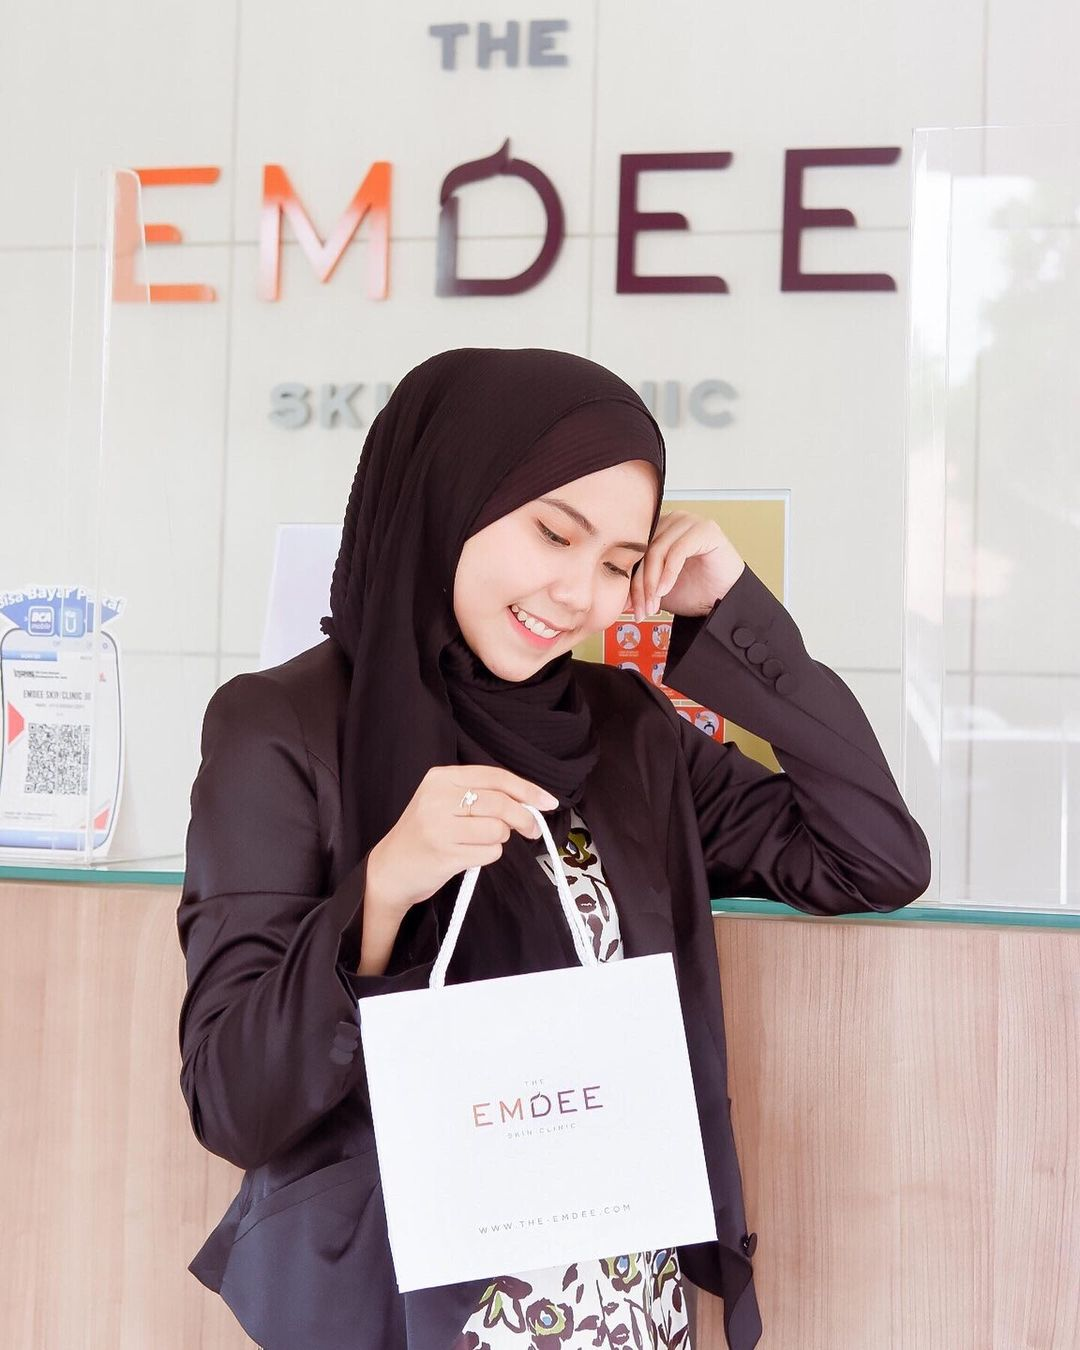 Emdee Skin Clinic